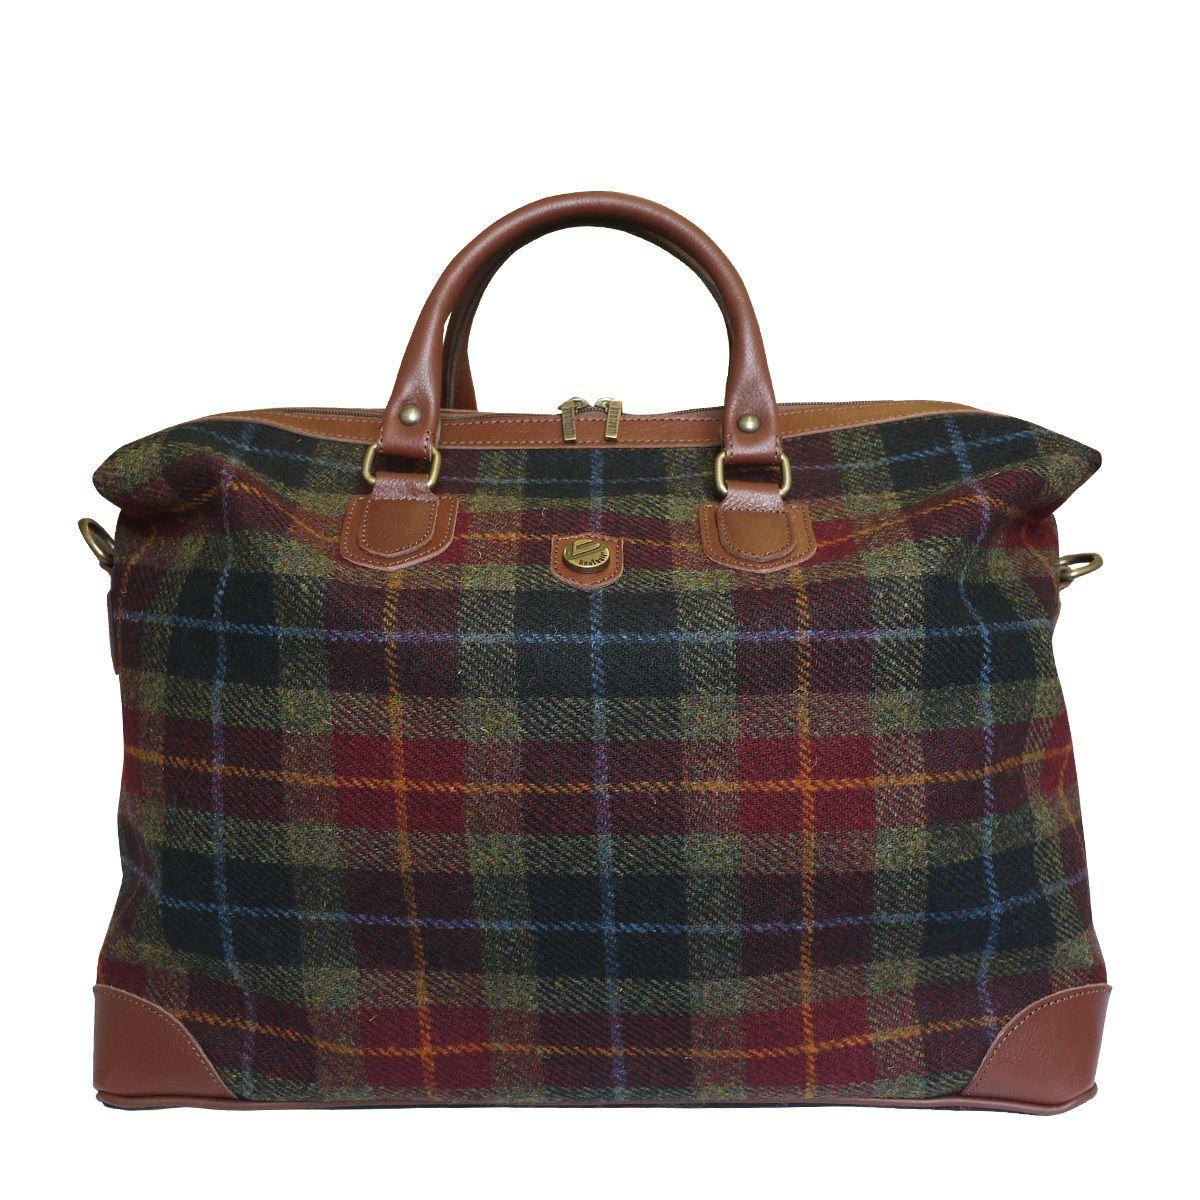 9f11a8a6f013 Attavanti - Bonfanti Leather and Harris Tweed Weekend Cabin Bag - Green and  Red Tartan